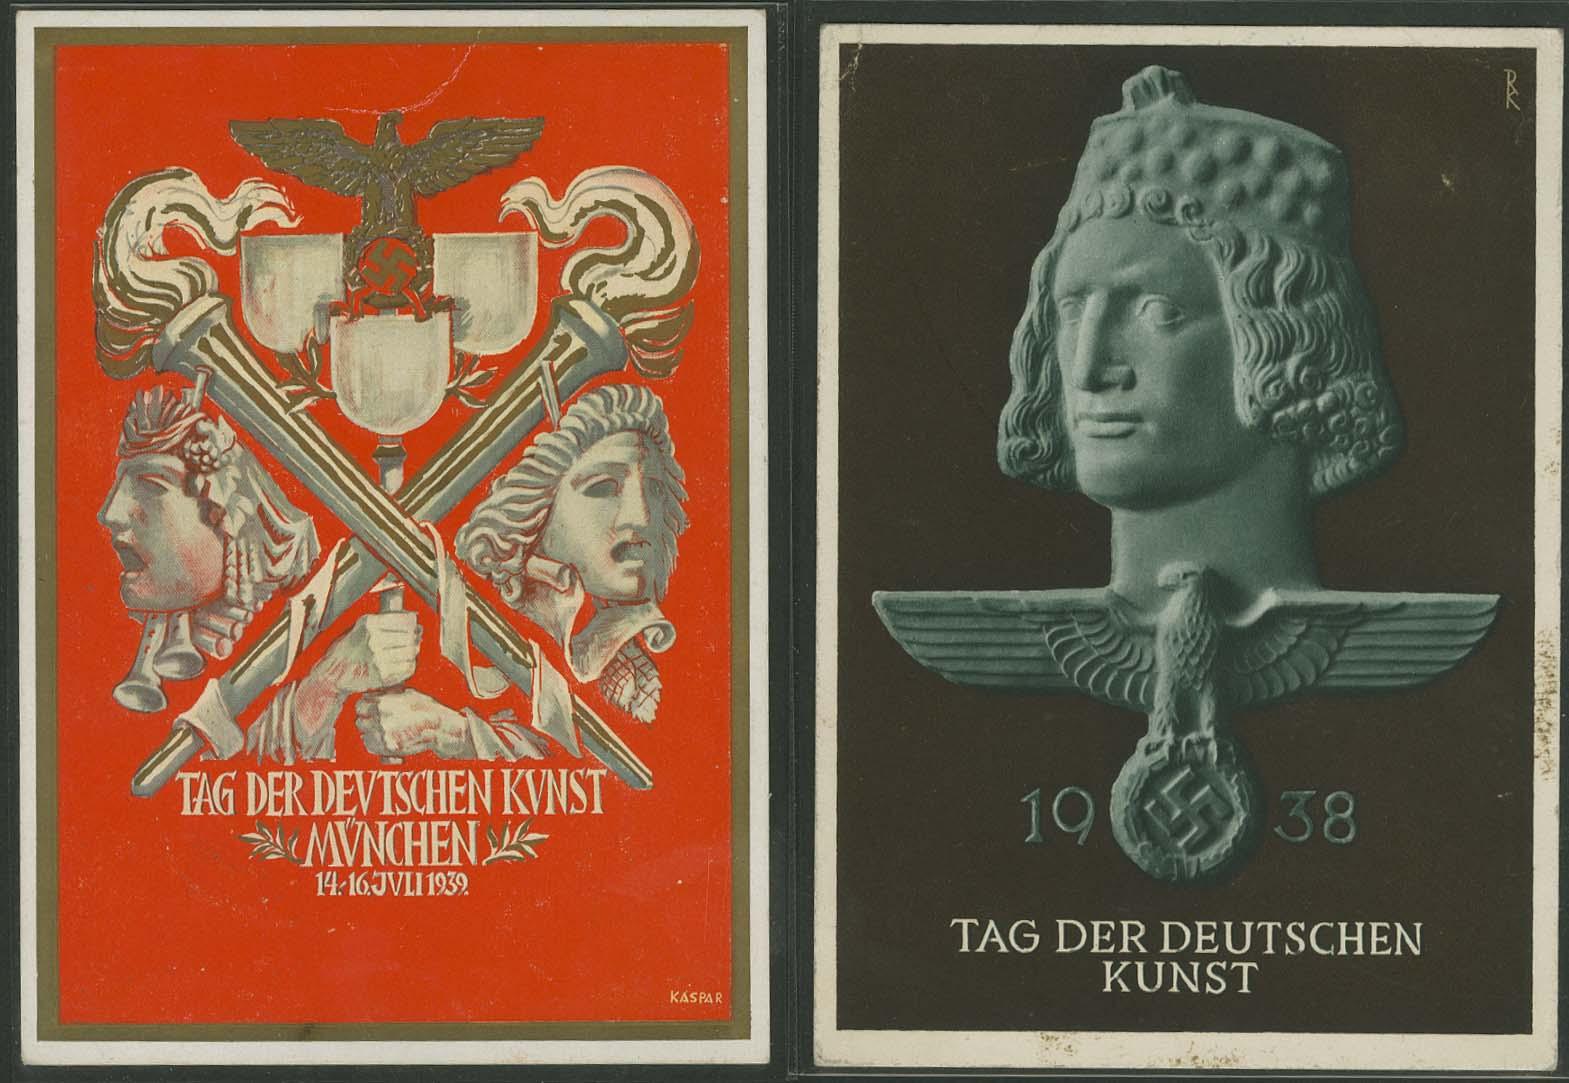 Lot 5841 - Propaganda-Karten II. WK Deutsche Propaganda-Karten -  Auktionshaus Ulrich Felzmann GmbH & Co. KG Auction #161 Philatelic & Numismatic